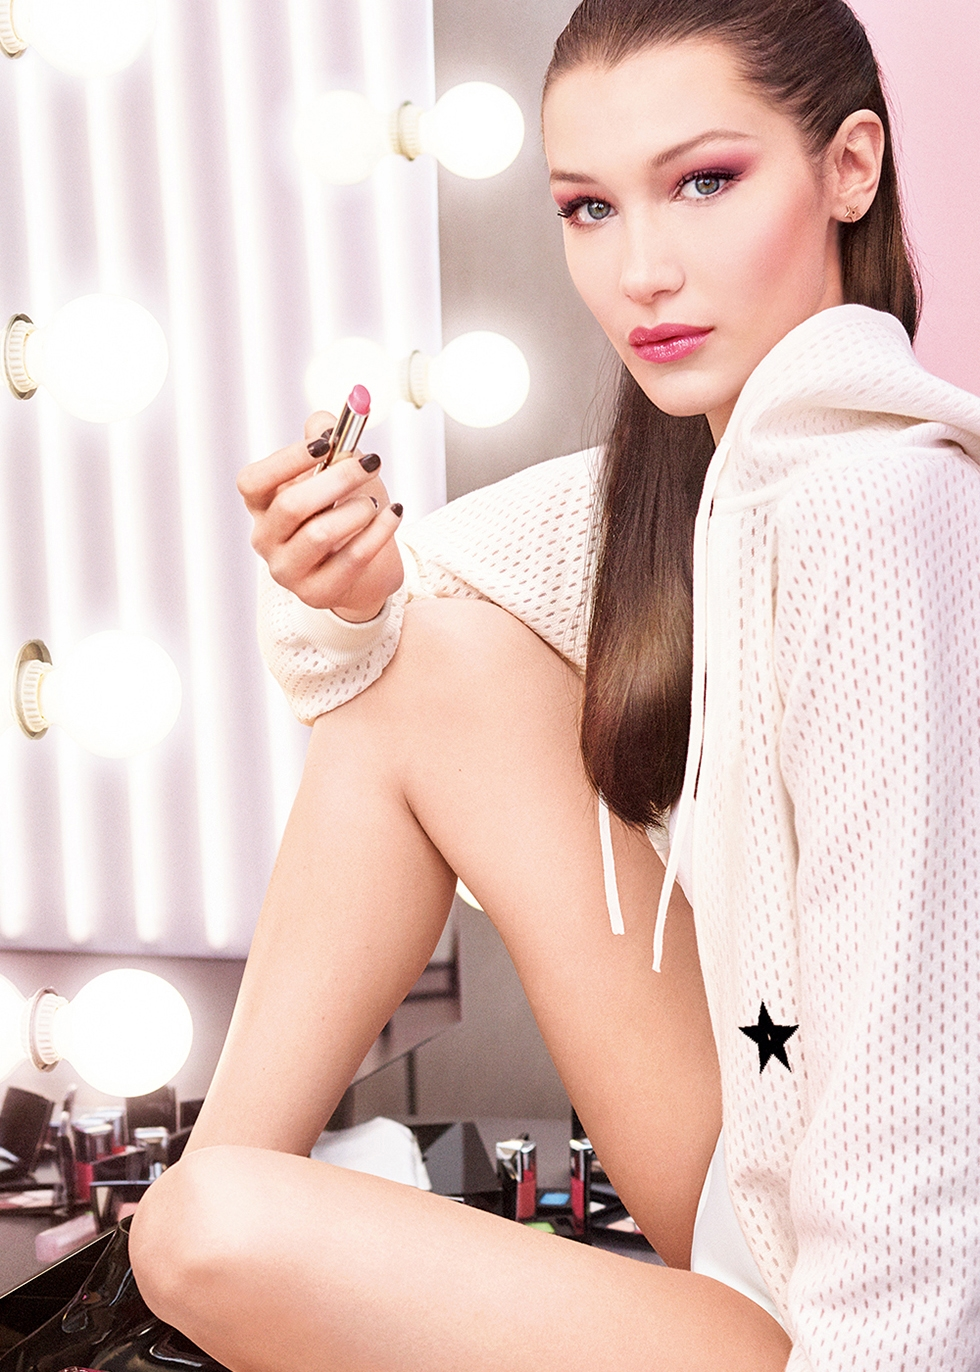 Dior Addict Lip Glow - Dior